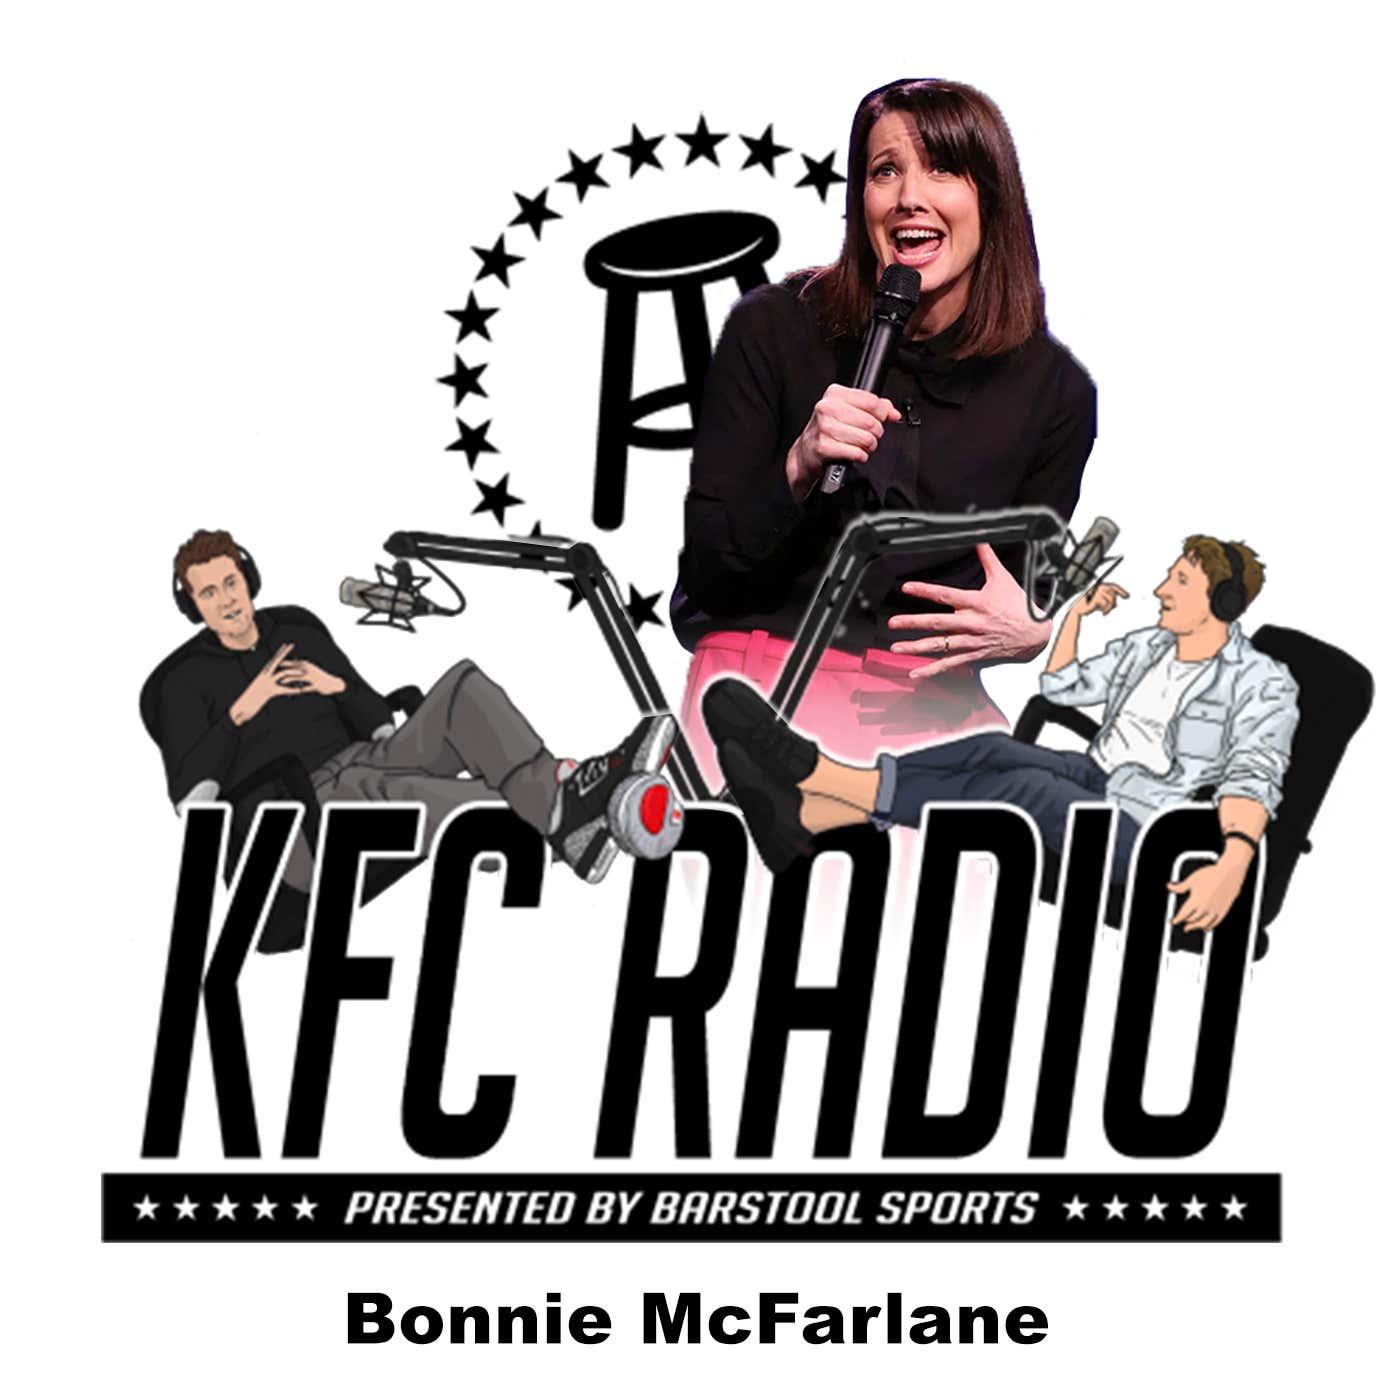 Bonnie McFarlane || The Last Great American Dick